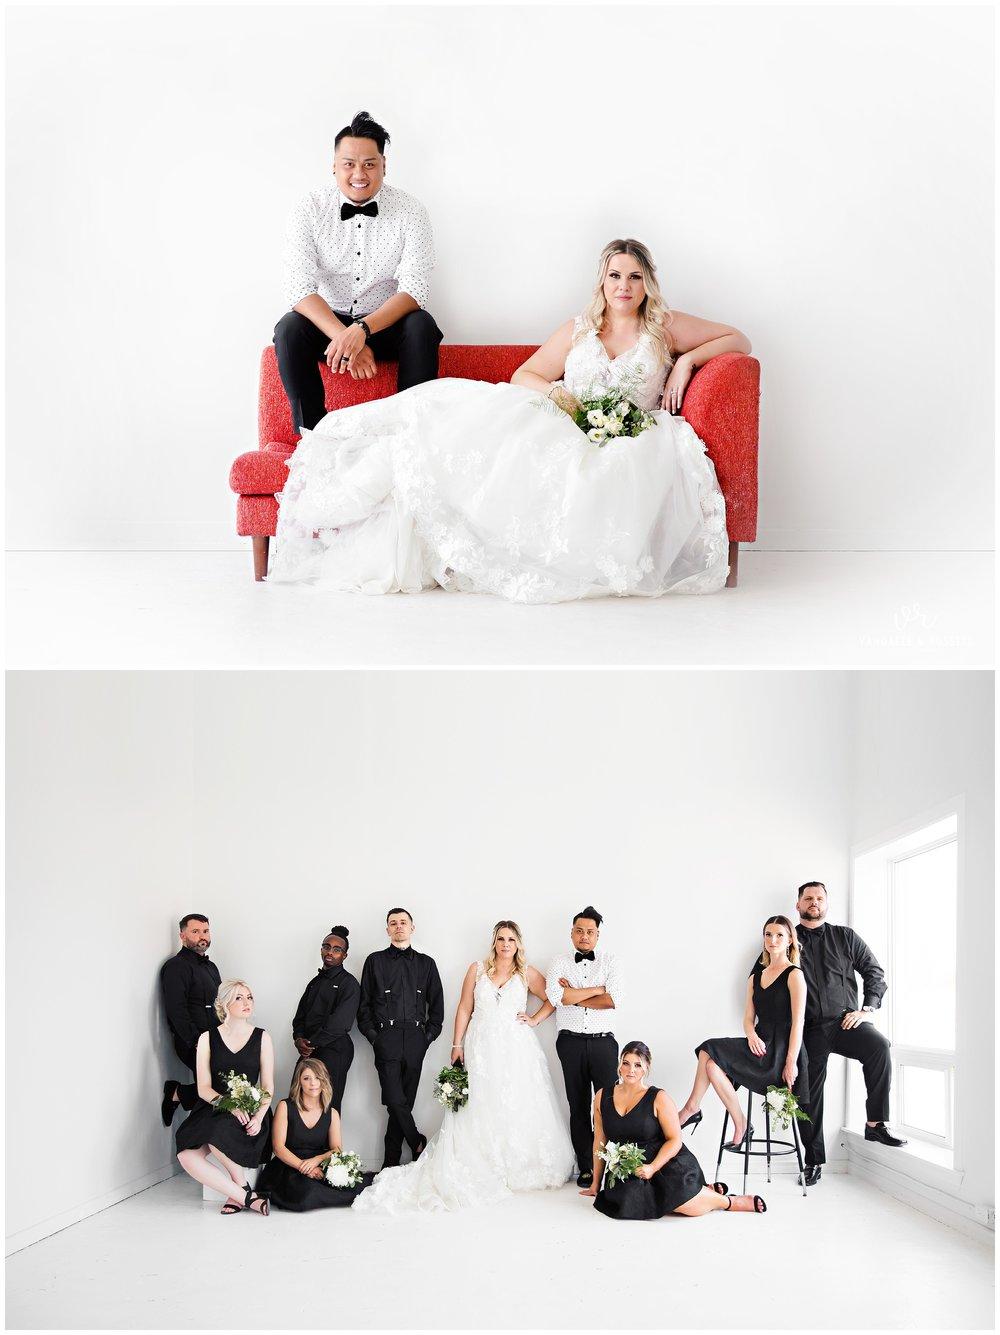 VanDaele-Russell-Wedding-Photography-London-Toronto-Ontario_0105.jpg